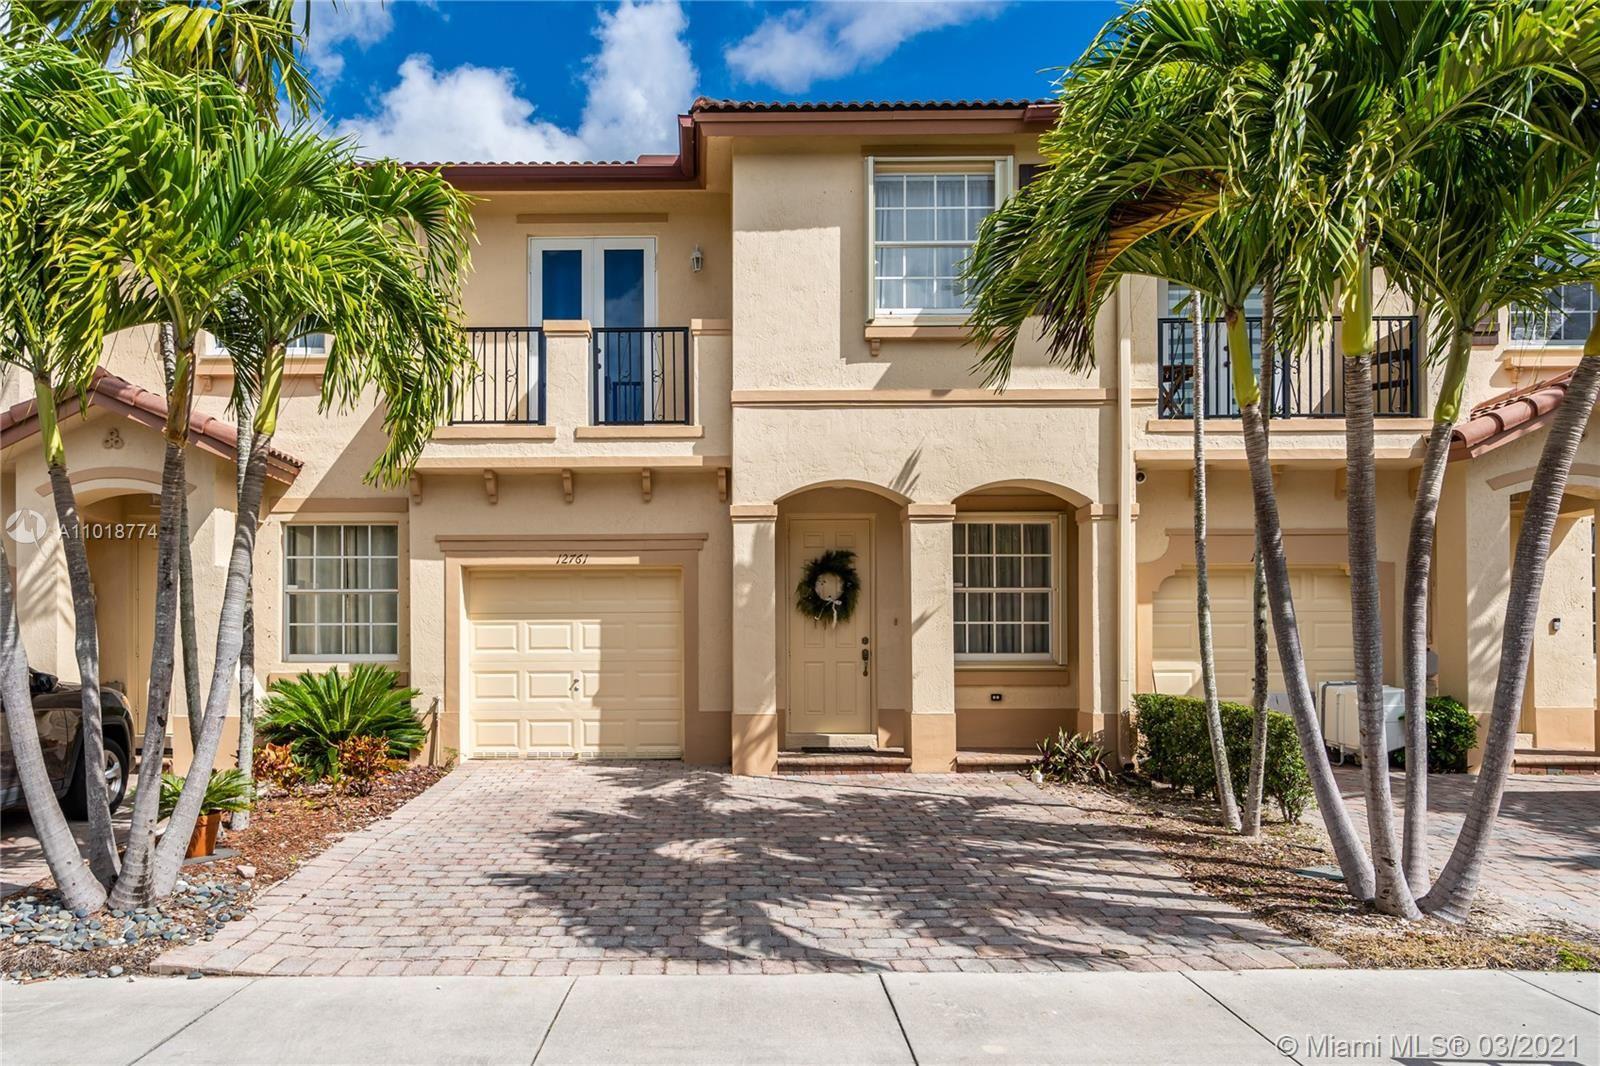 12761 SW 132nd Ter, Miami, FL 33186 - #: A11018774